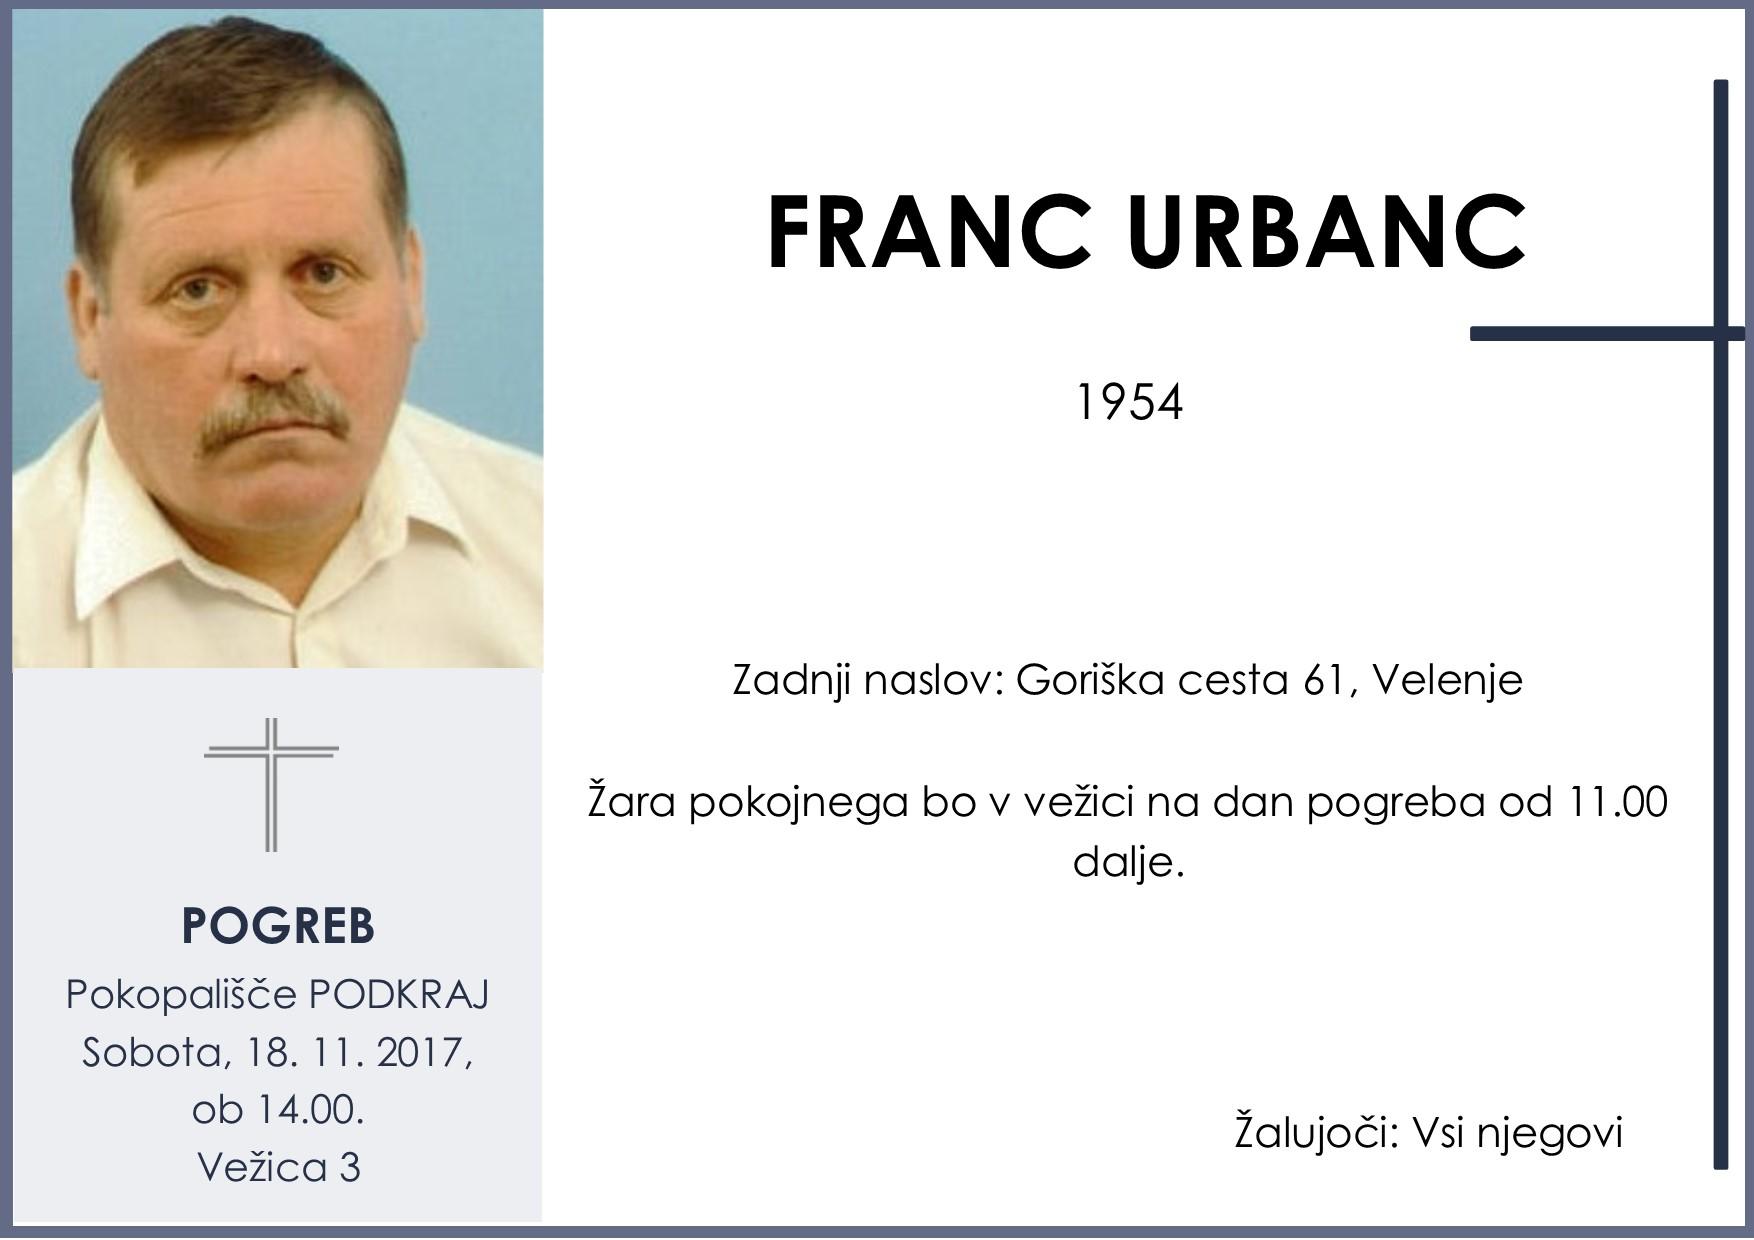 FRANC URBANC, Podkraj, 18. 11. 2017